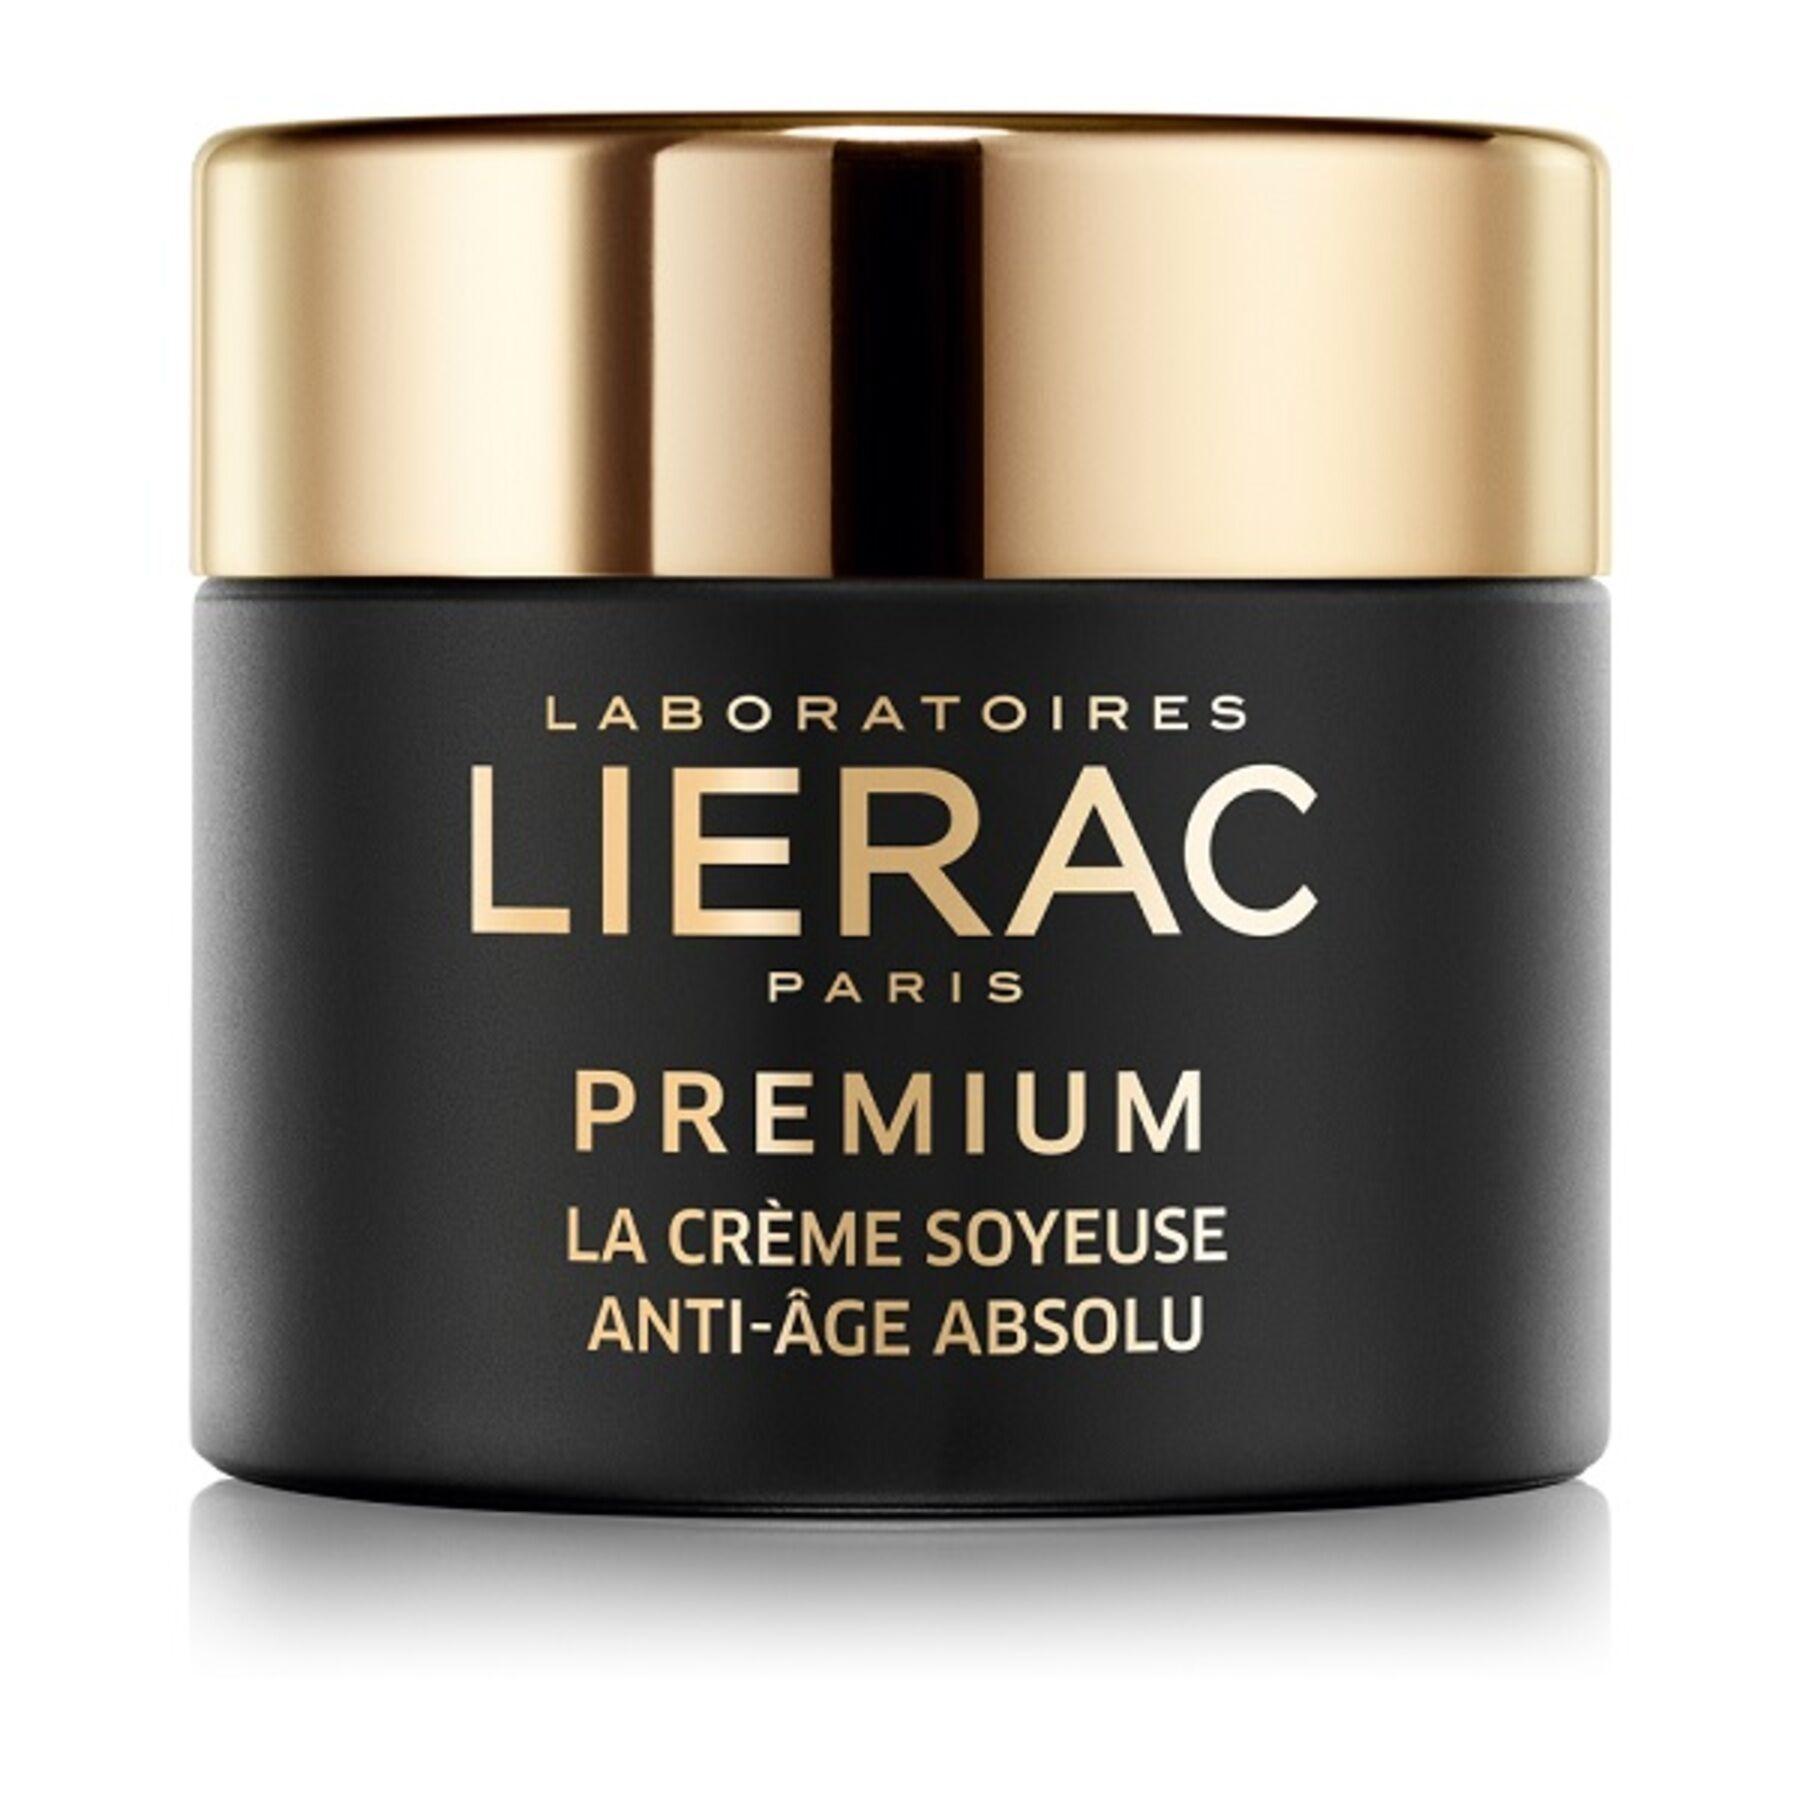 lierac (laboratoire native it) premium la creme soyeuse 50 ml